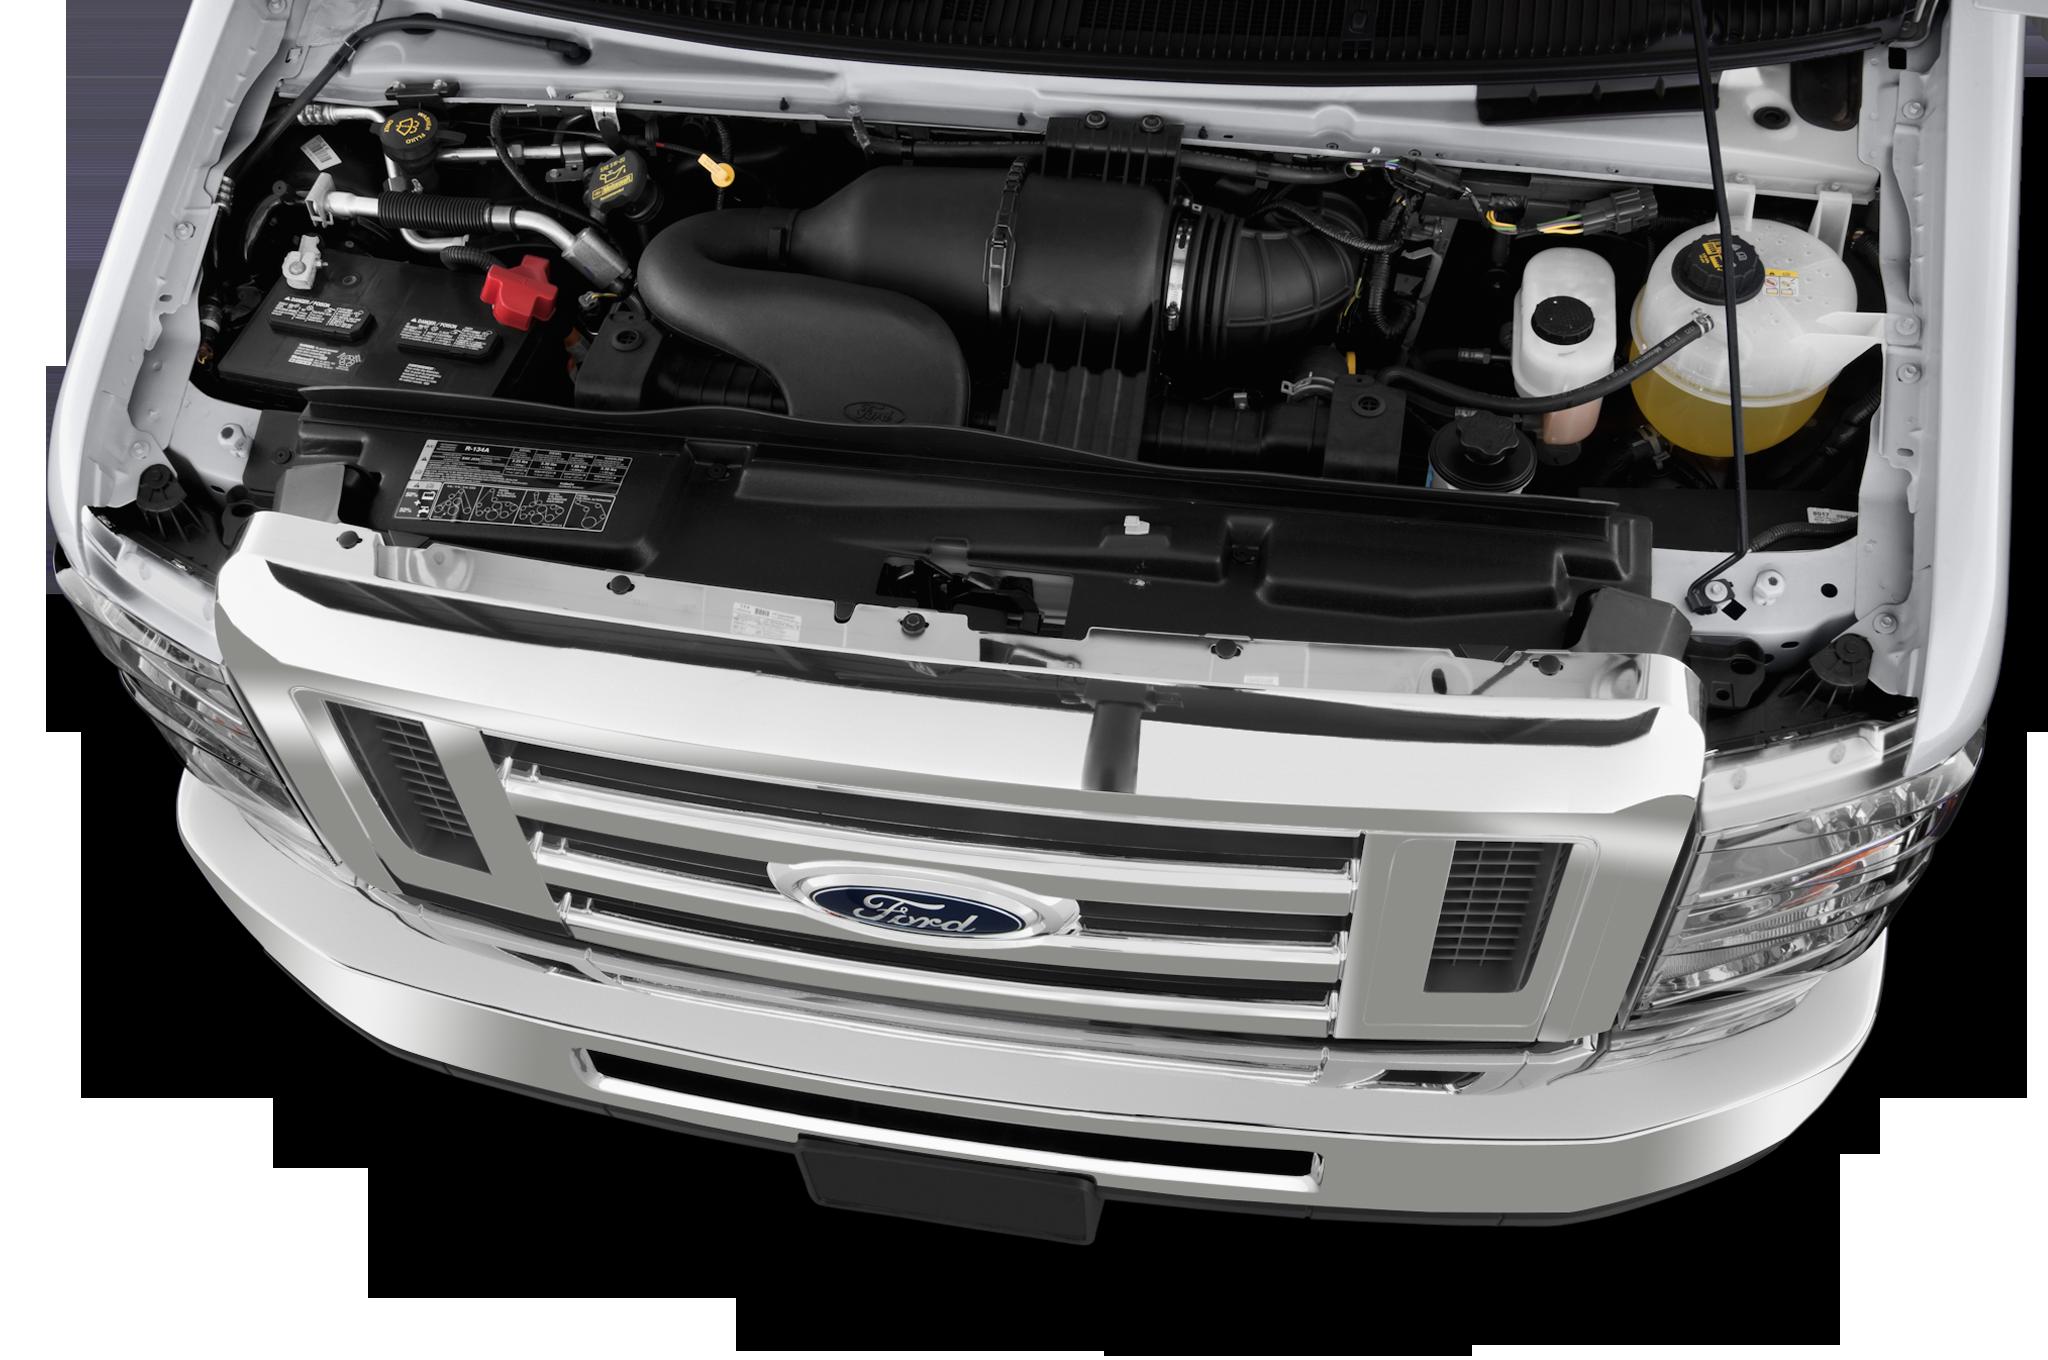 Ford Transit Van To Offer Diesel Engine Option Australia Engines 18 49